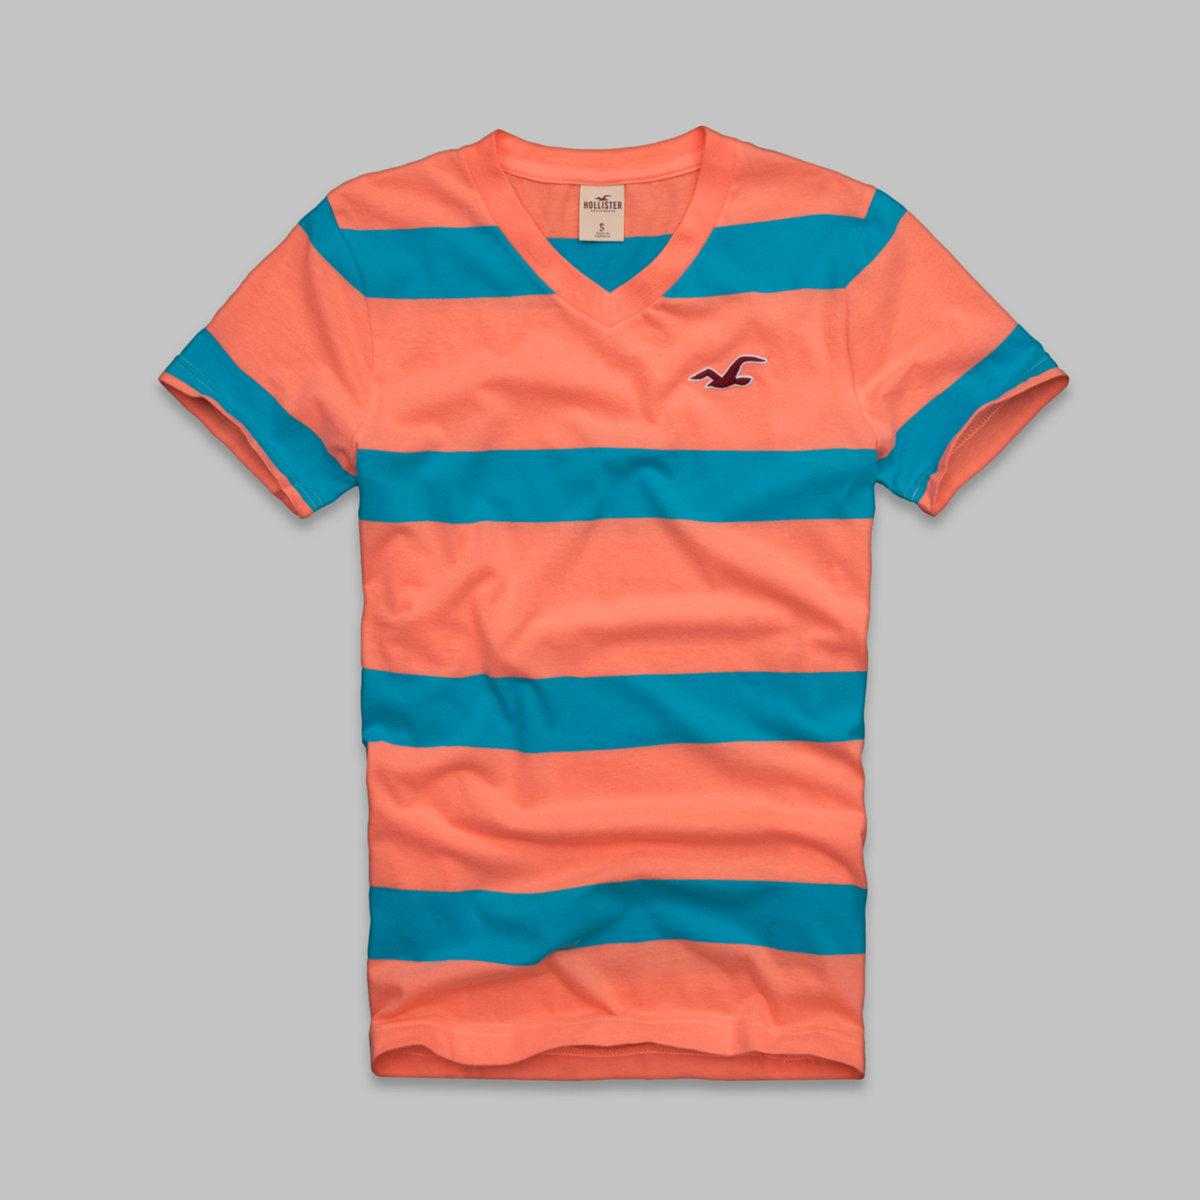 Hobson T-Shirt